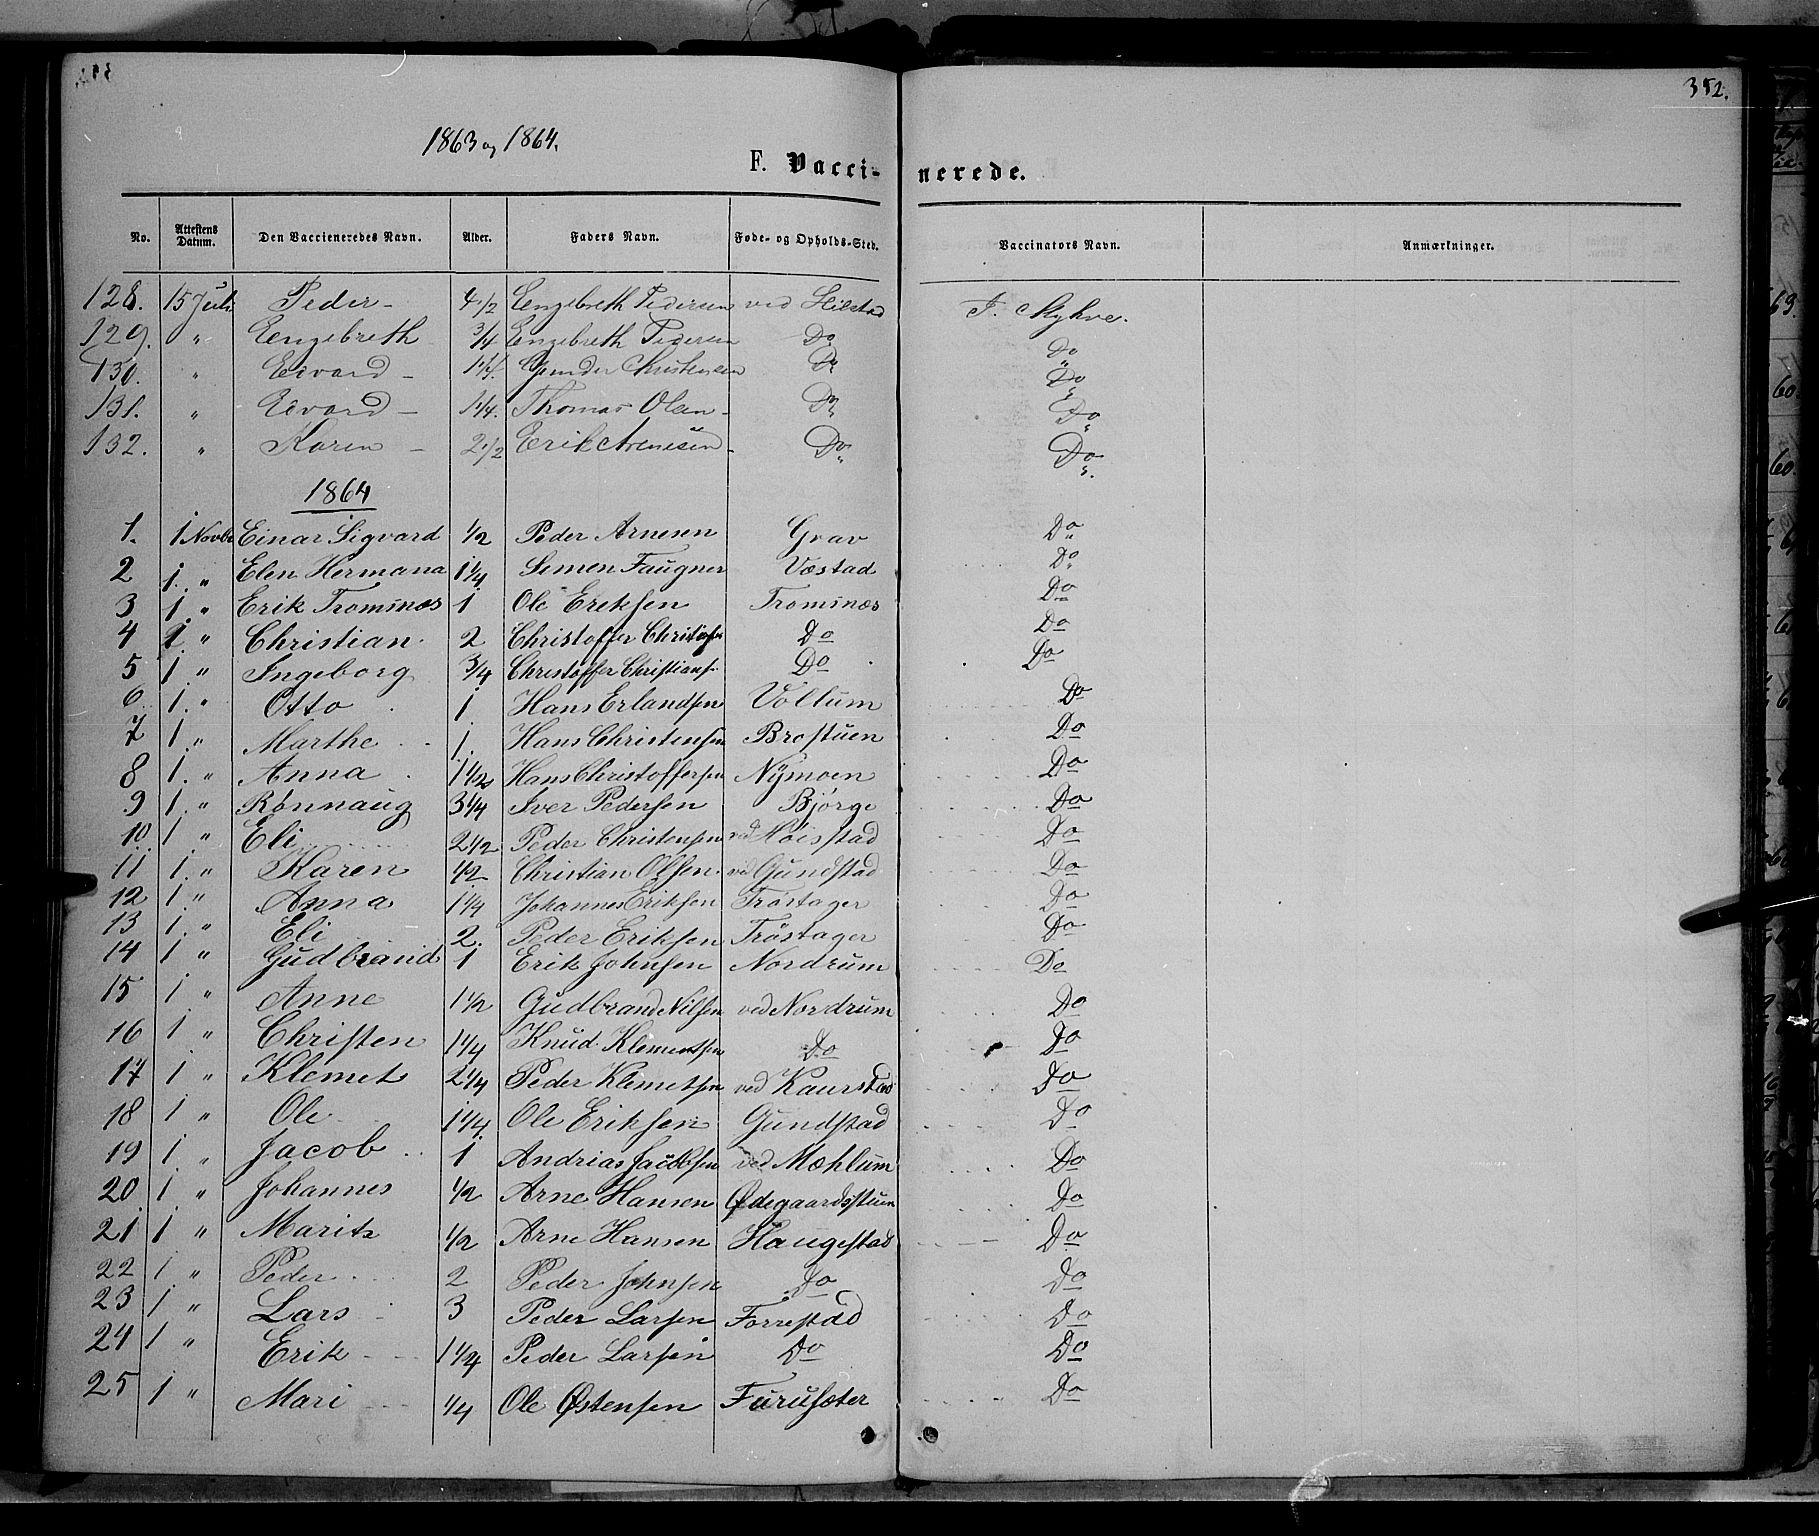 SAH, Ringebu prestekontor, Ministerialbok nr. 7, 1860-1877, s. 352